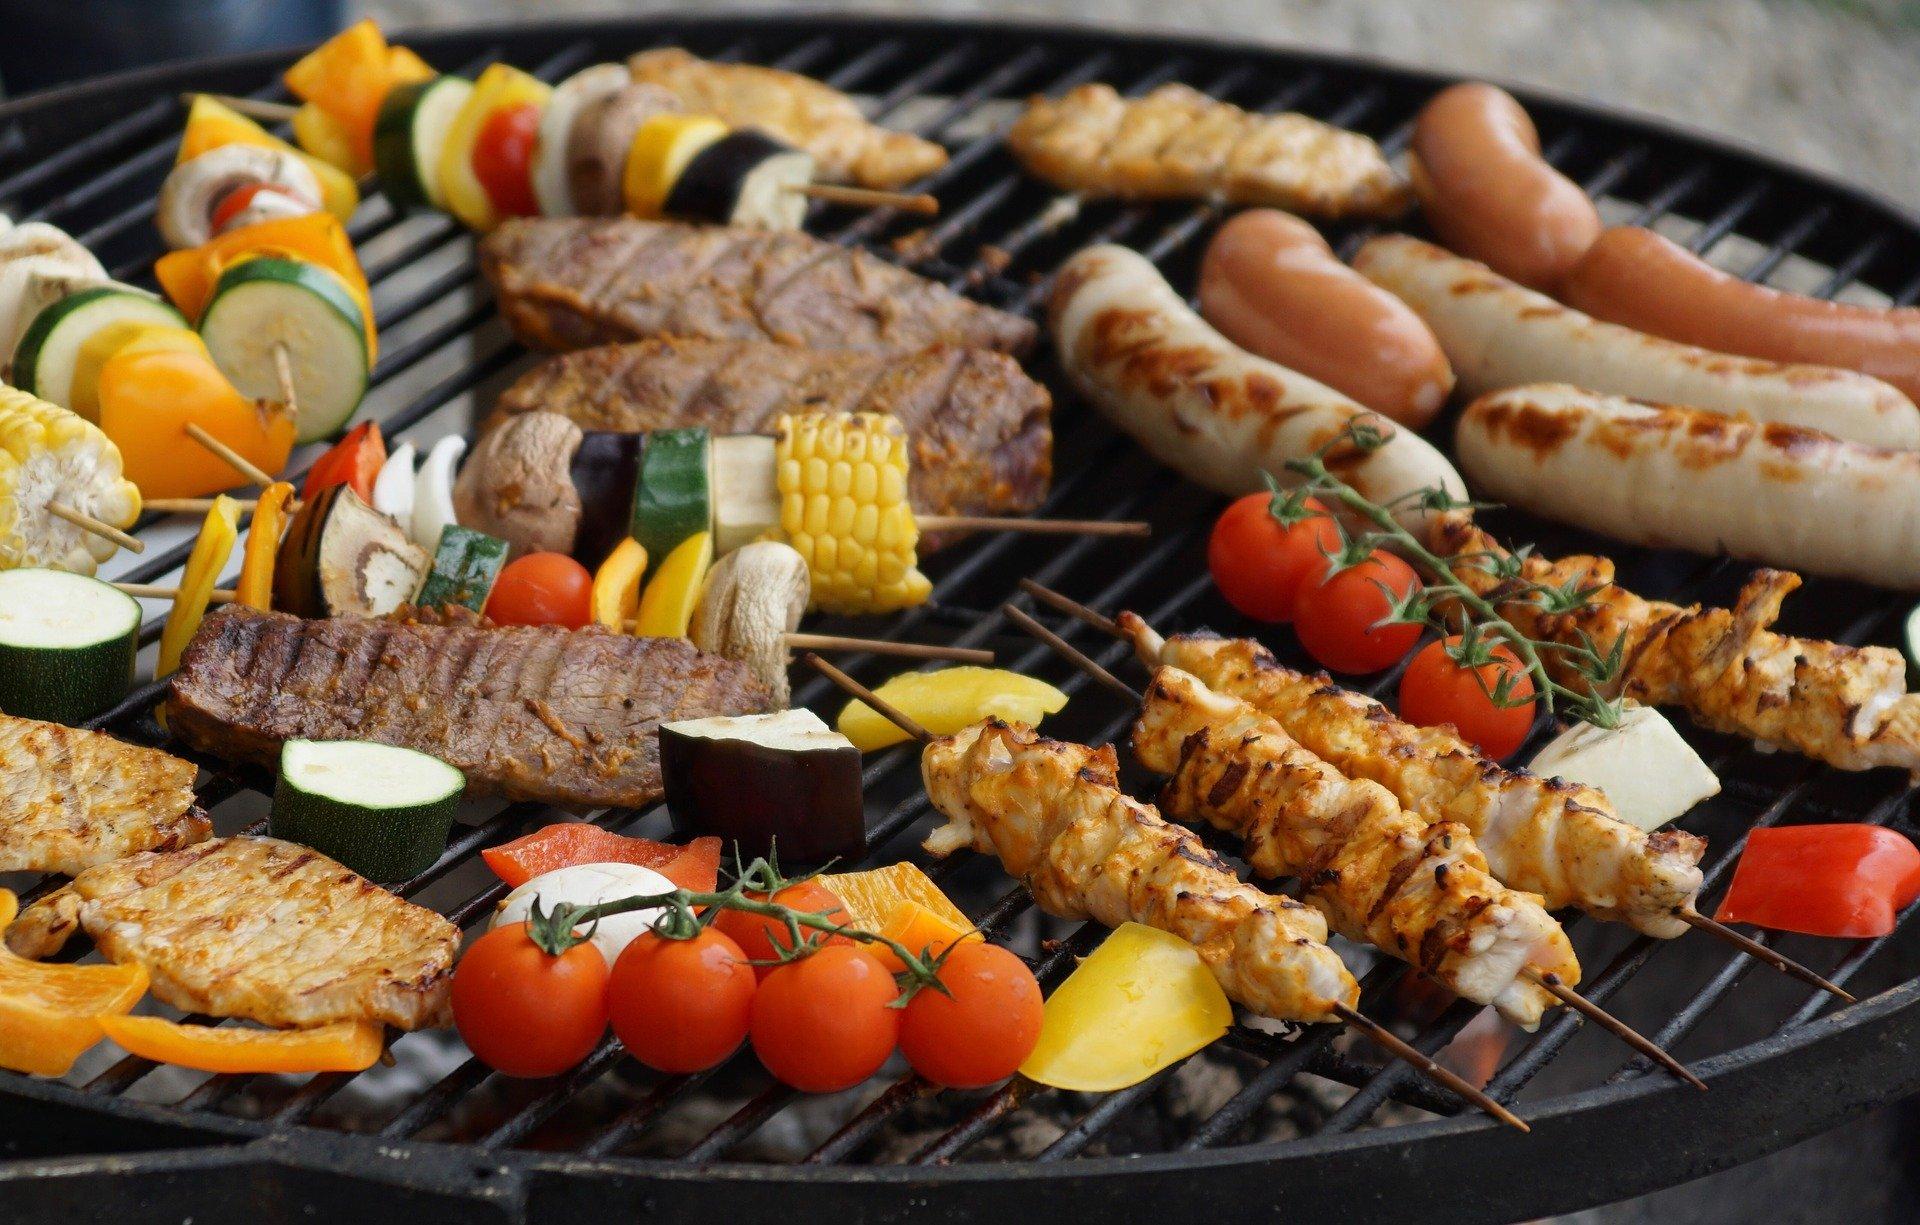 kebabs and vegetables on skewers on grill